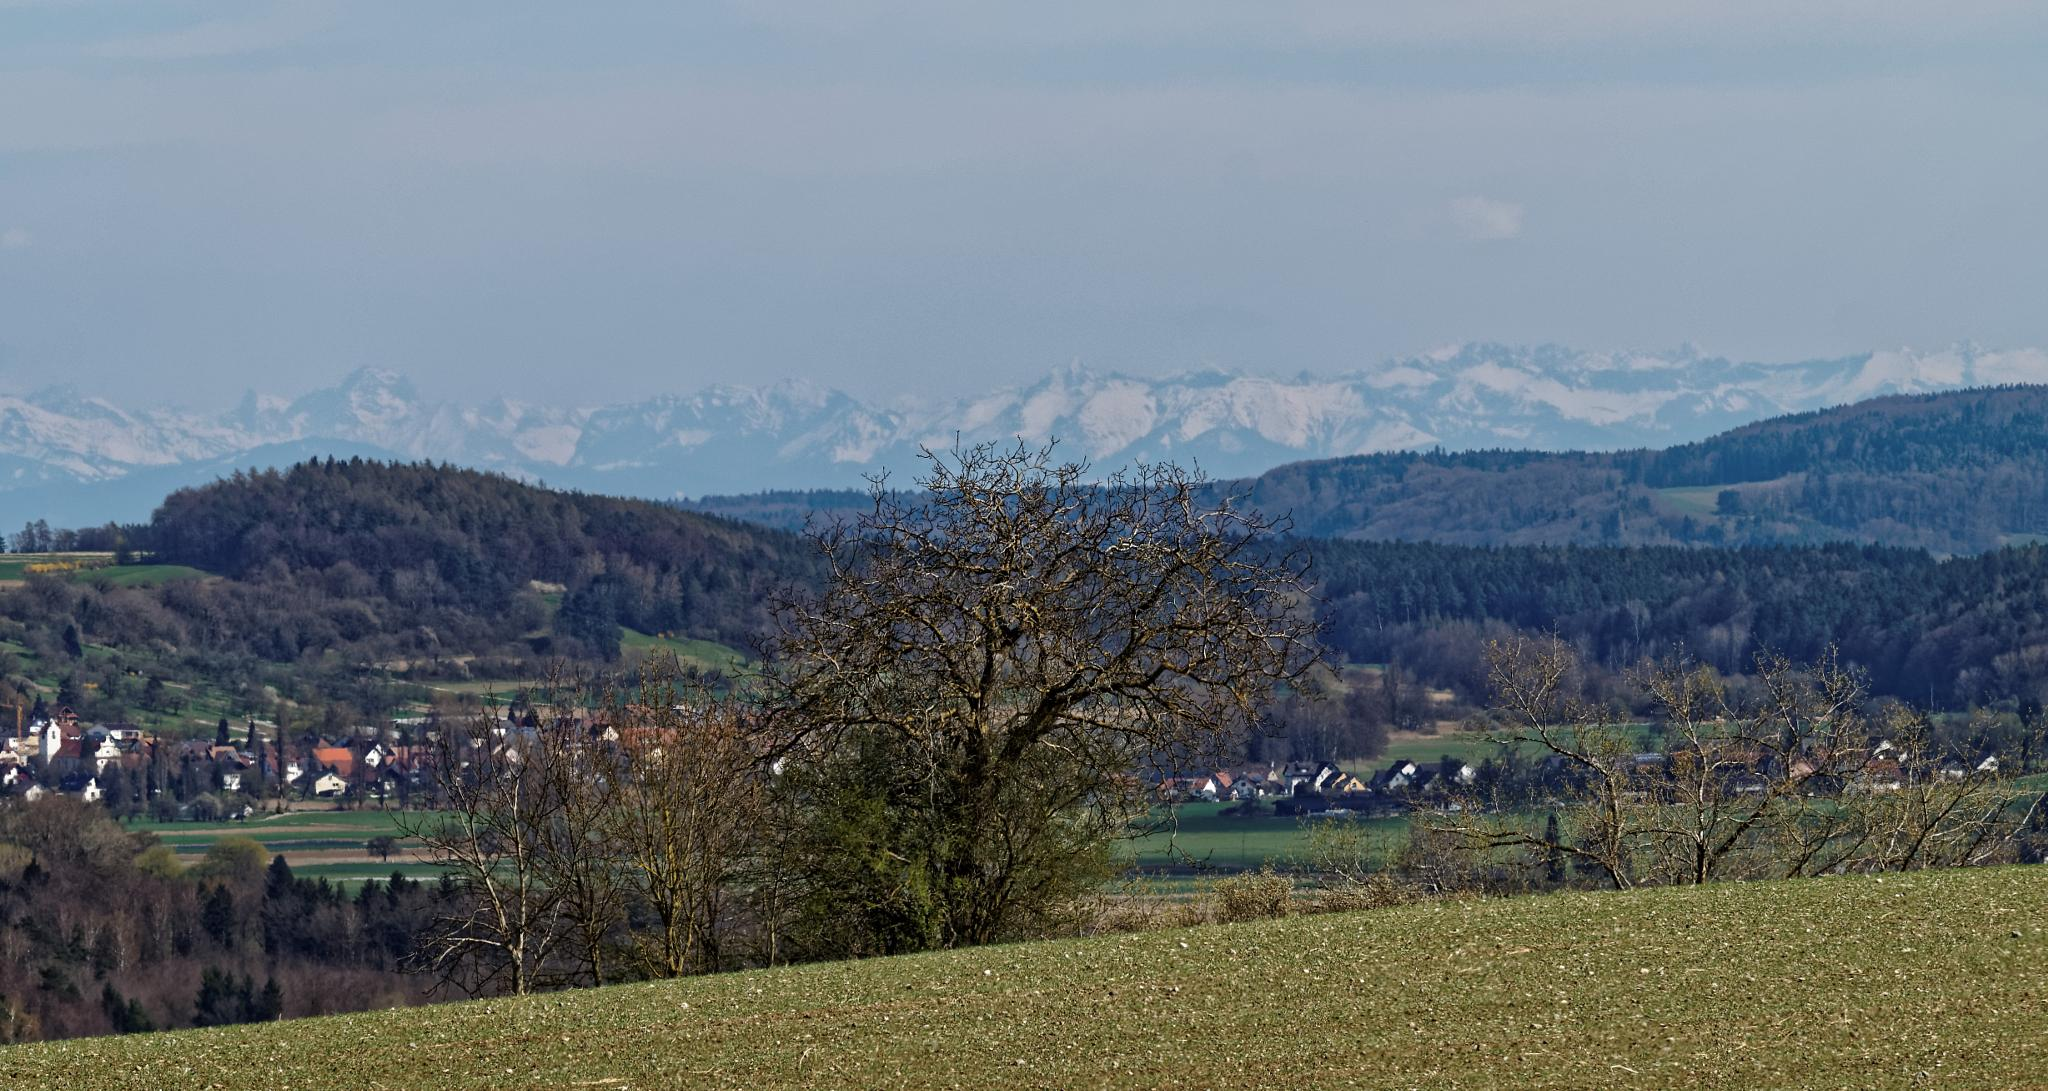 Mountains (60 Km away) by anwai